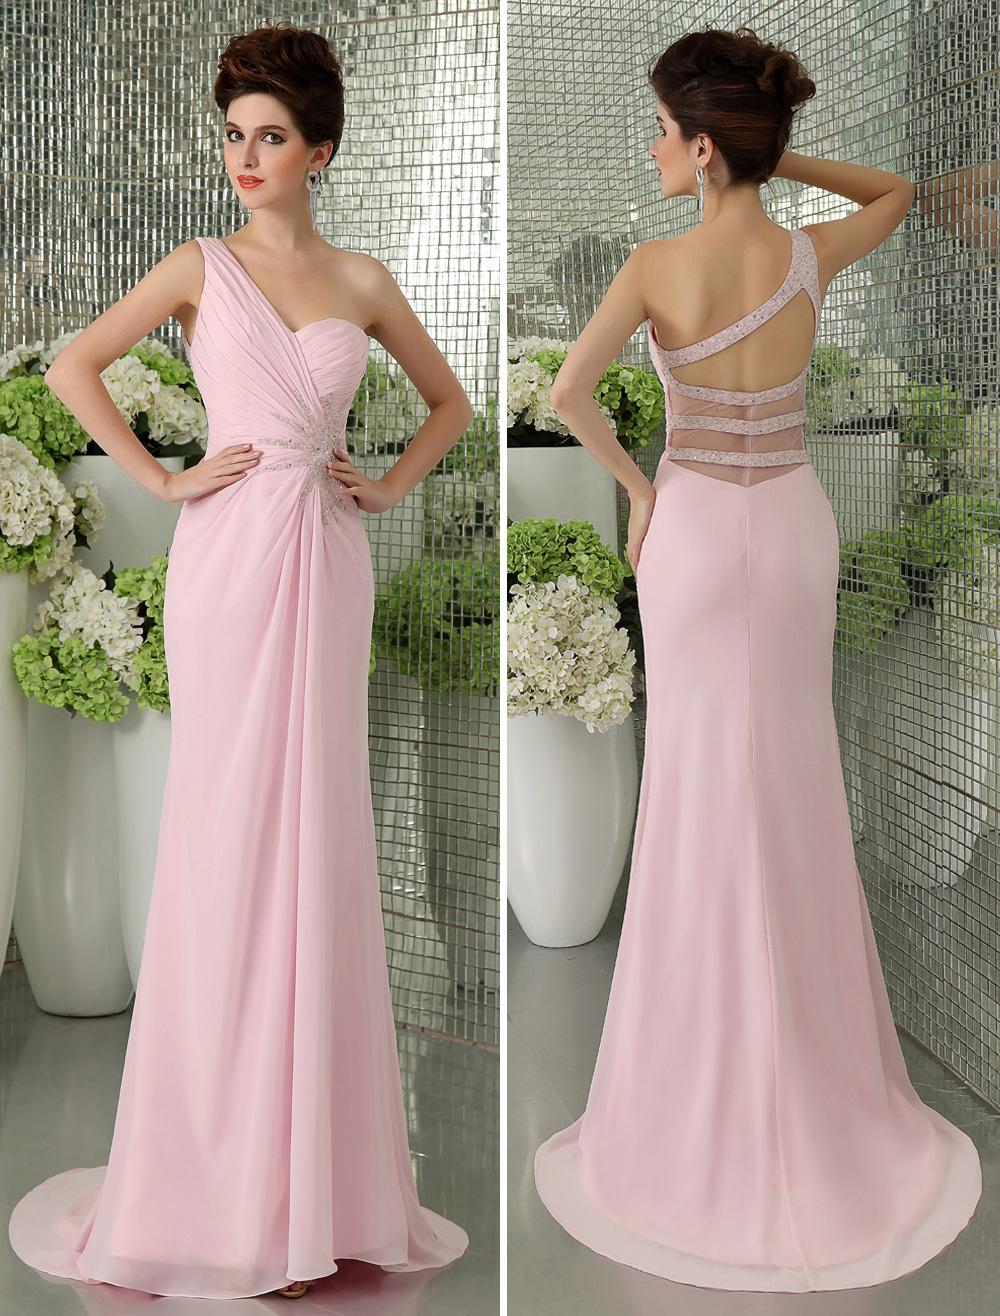 Sheath Pink Chiffon Beading One-Shoulder Sweep Women's Prom Dress  Milanoo